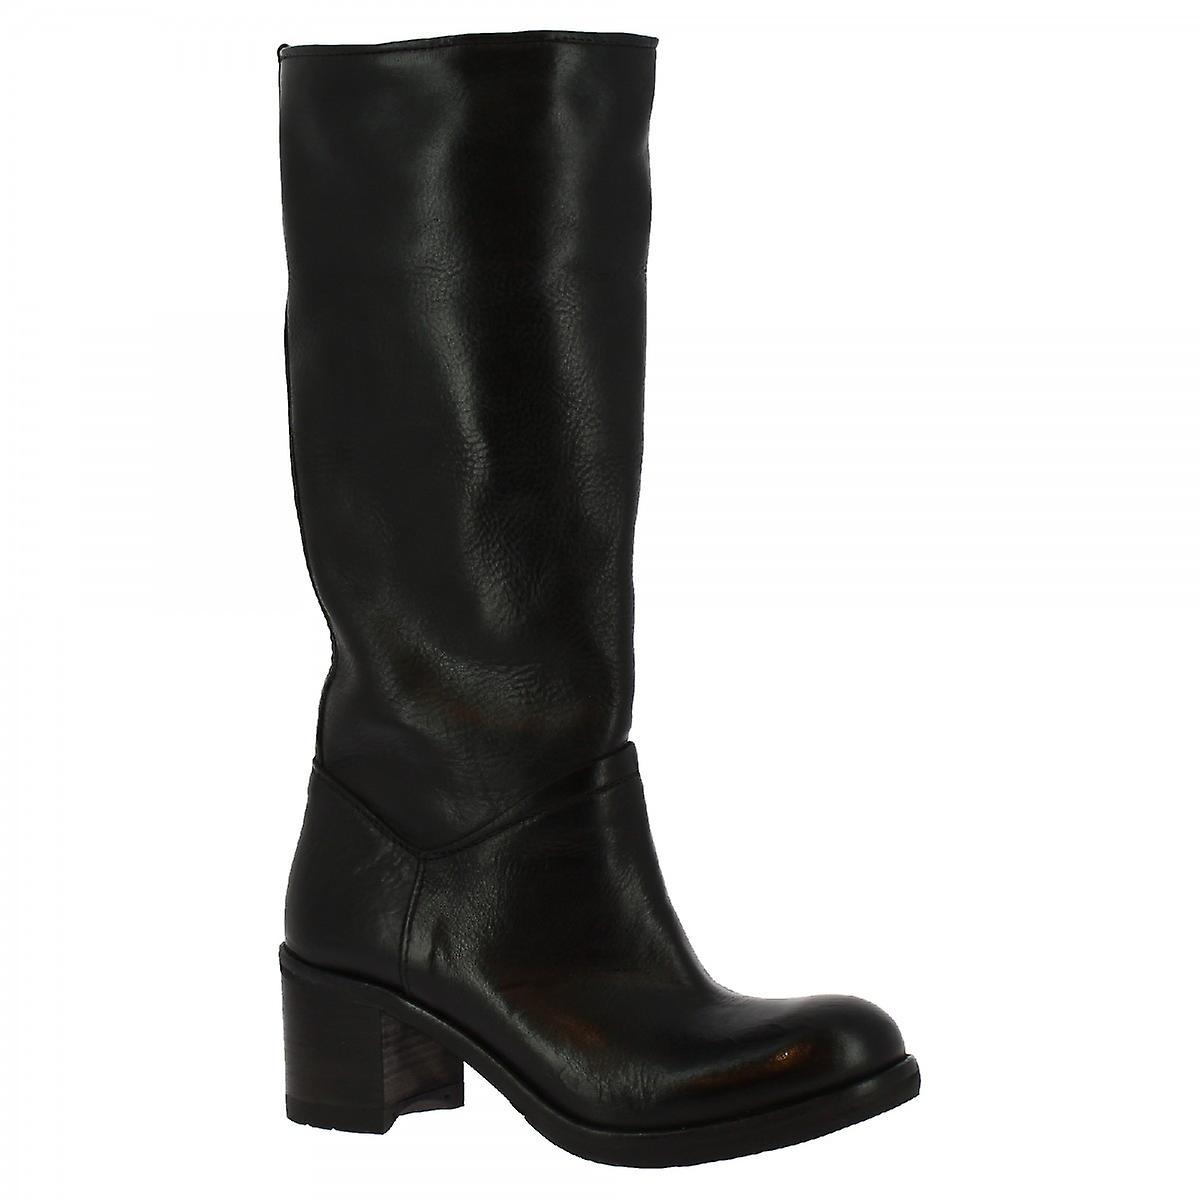 Leonardo Shoes Women's handmade heels knee high boots in black calf leather Ff78a